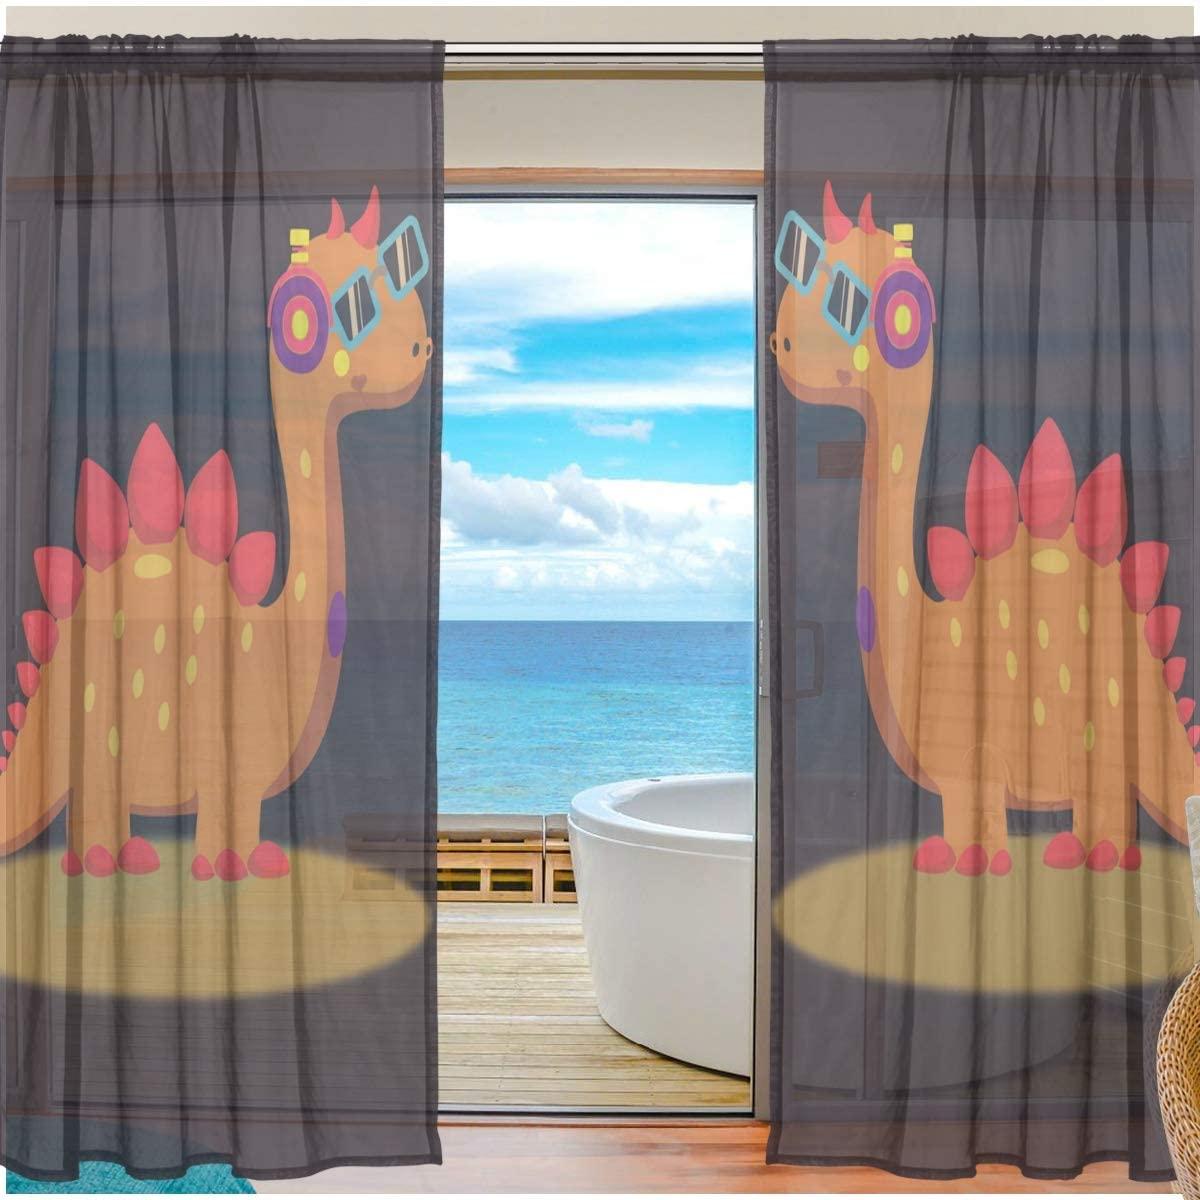 Window Sheer Curtains Orange Dinosaur Digital Printed Polyester Fiber Drapes for Door Kitchen Living Room Bedroom